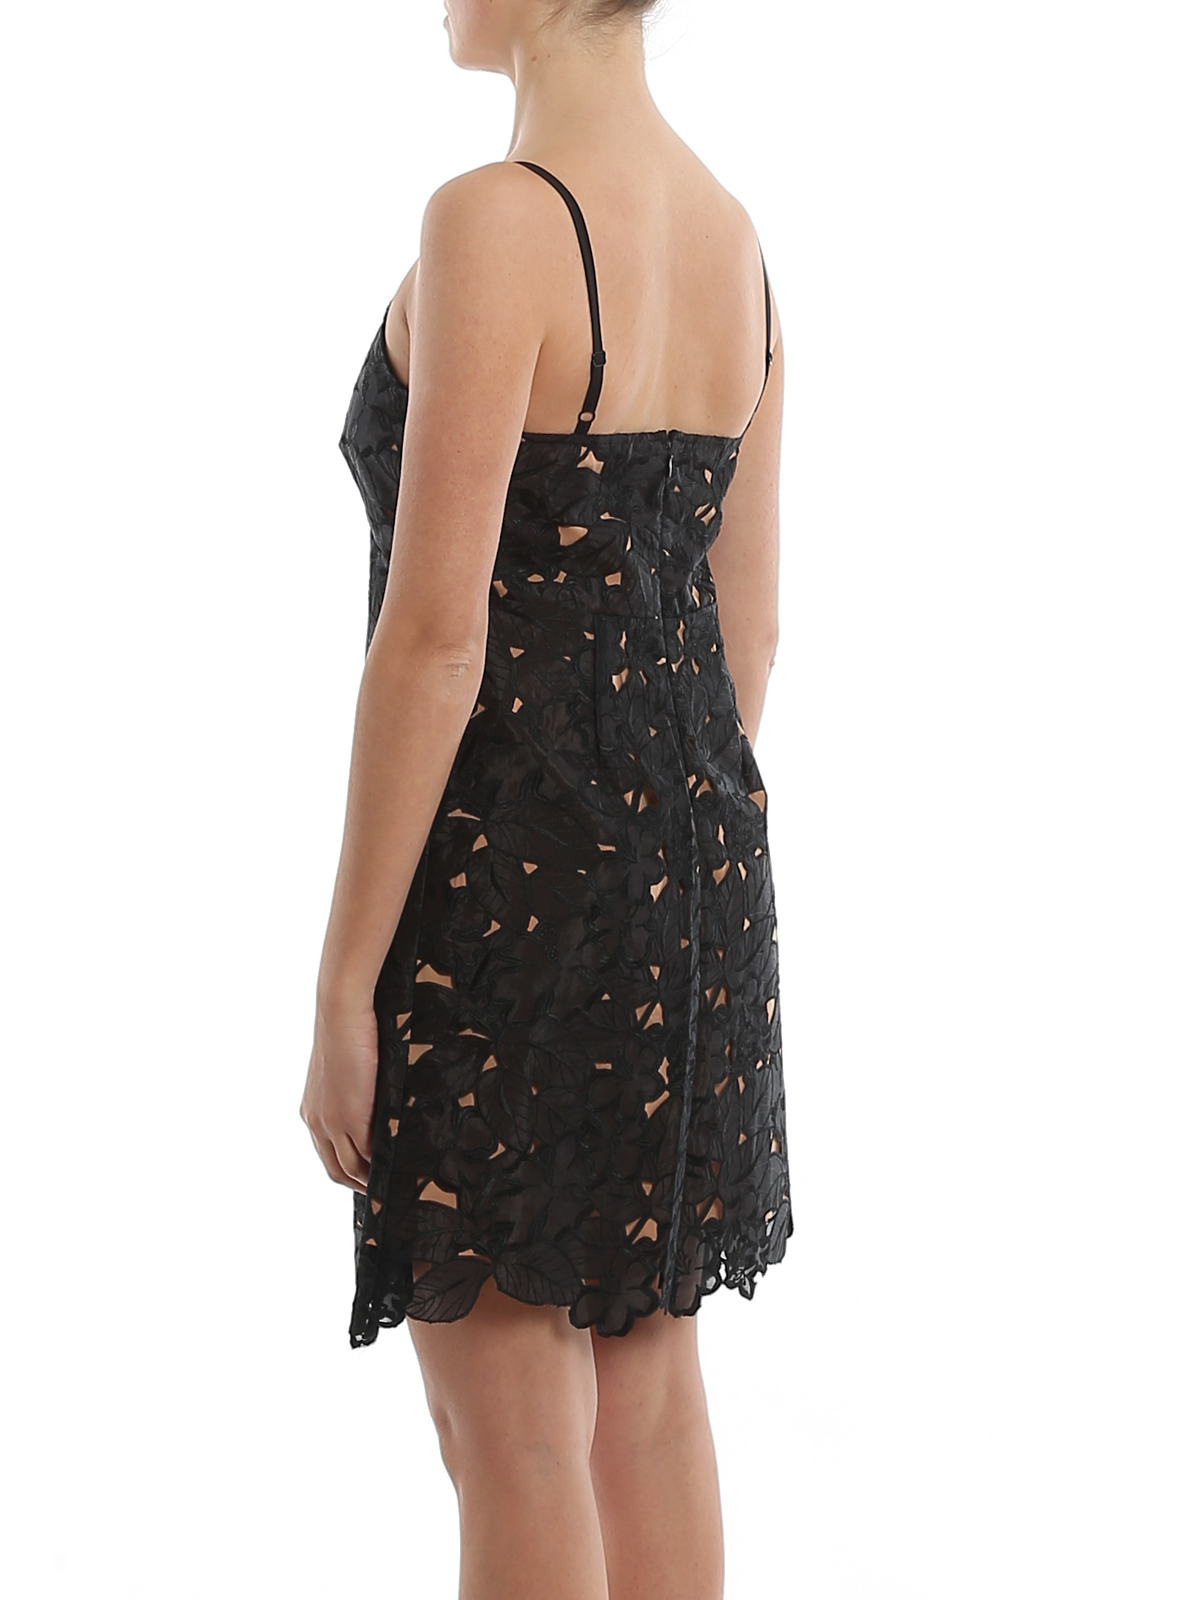 michael kors - abendkleid - schwarz - kurze kleider